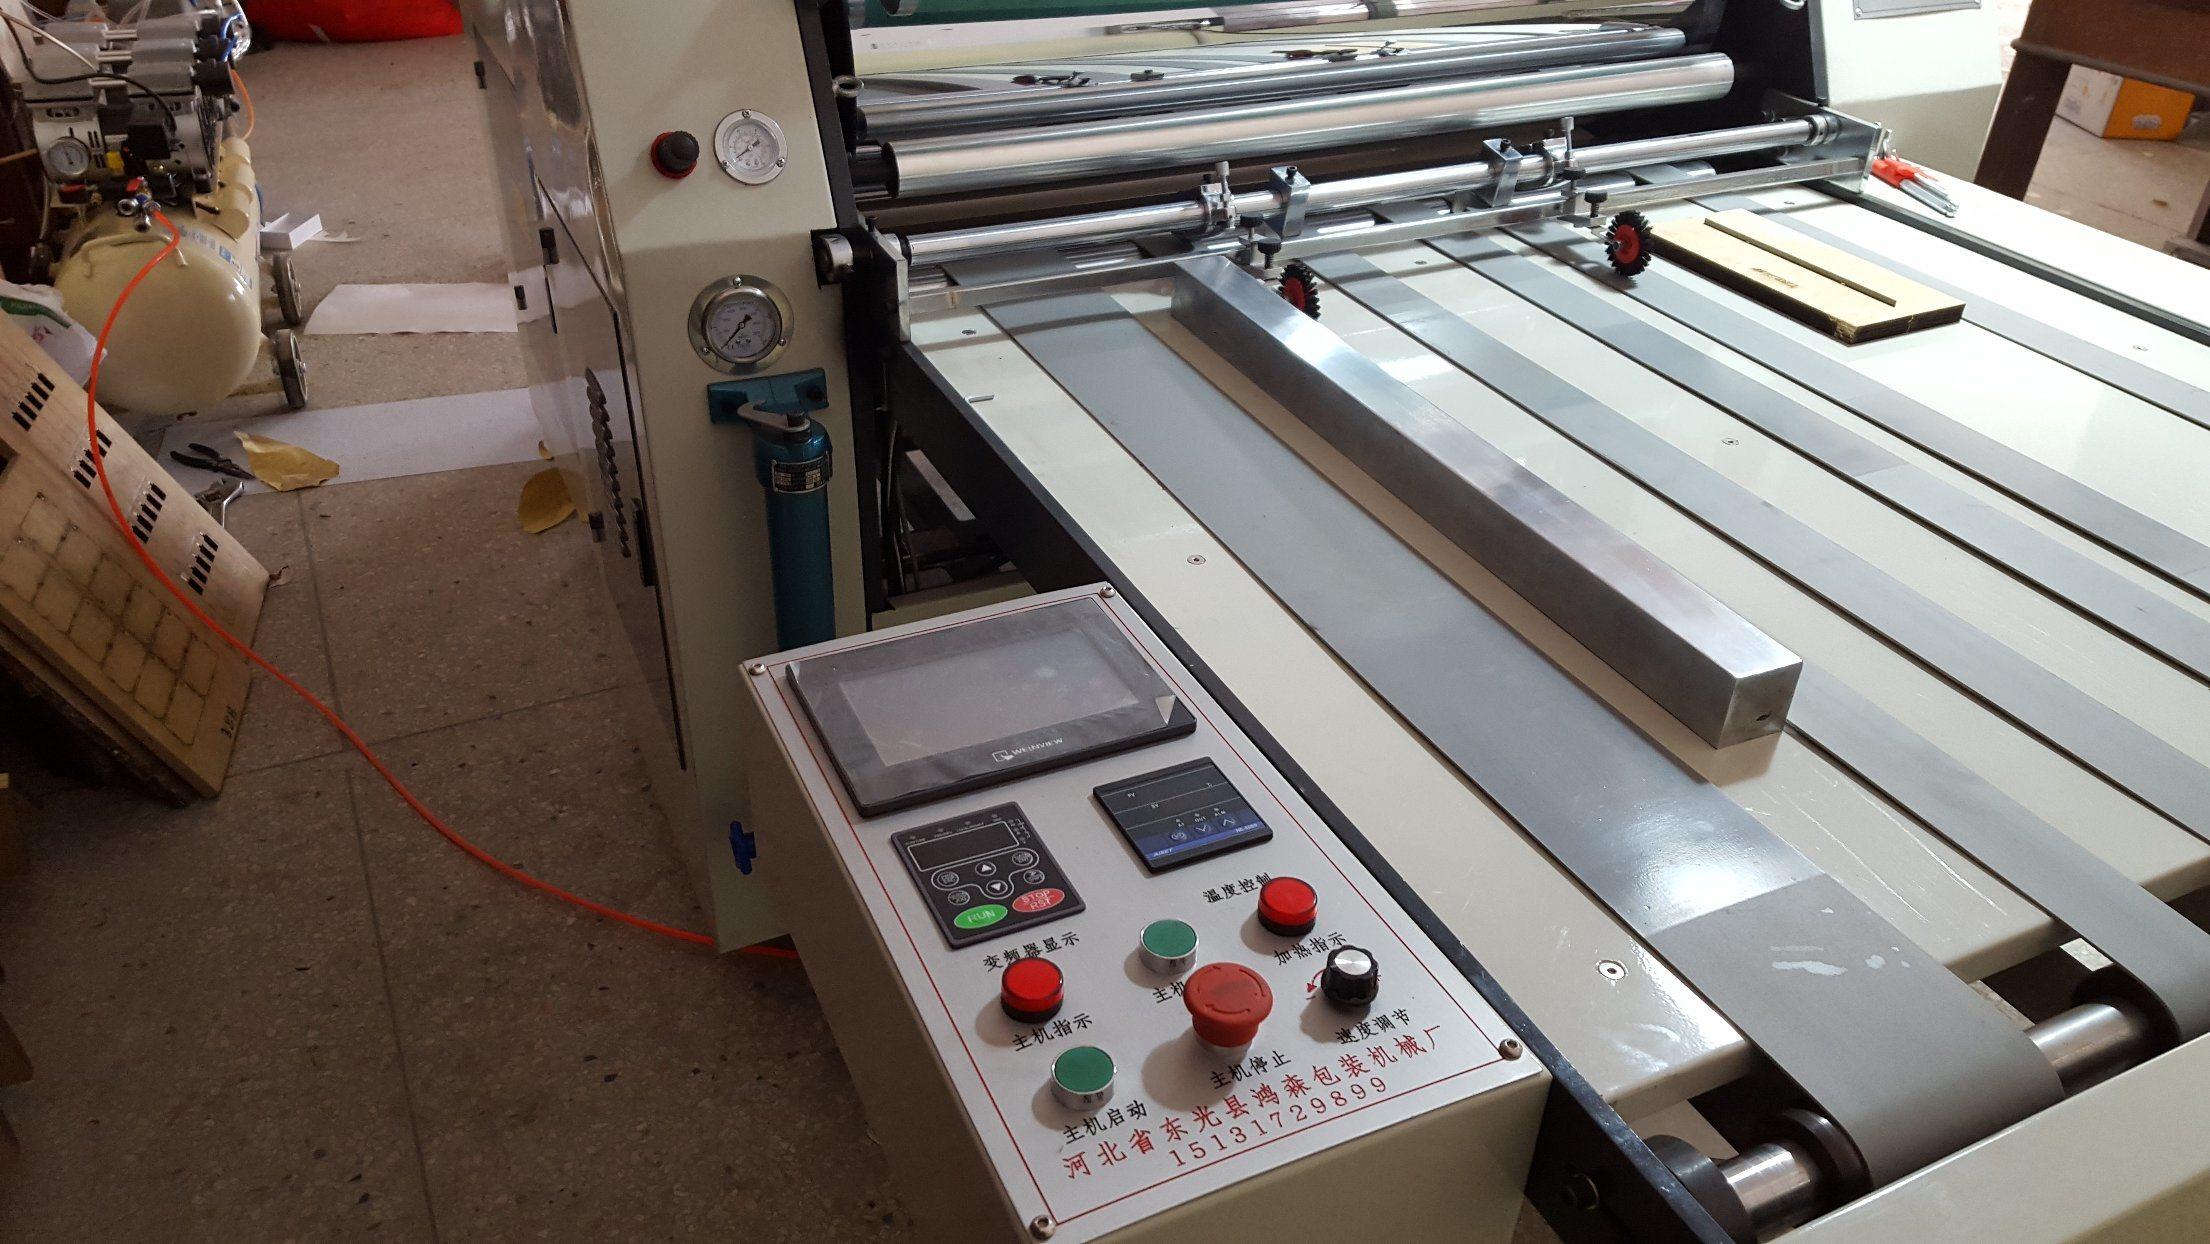 Glueless/ Hot/Cold BOPP Thermal Film Laminating Machine (Lamination)